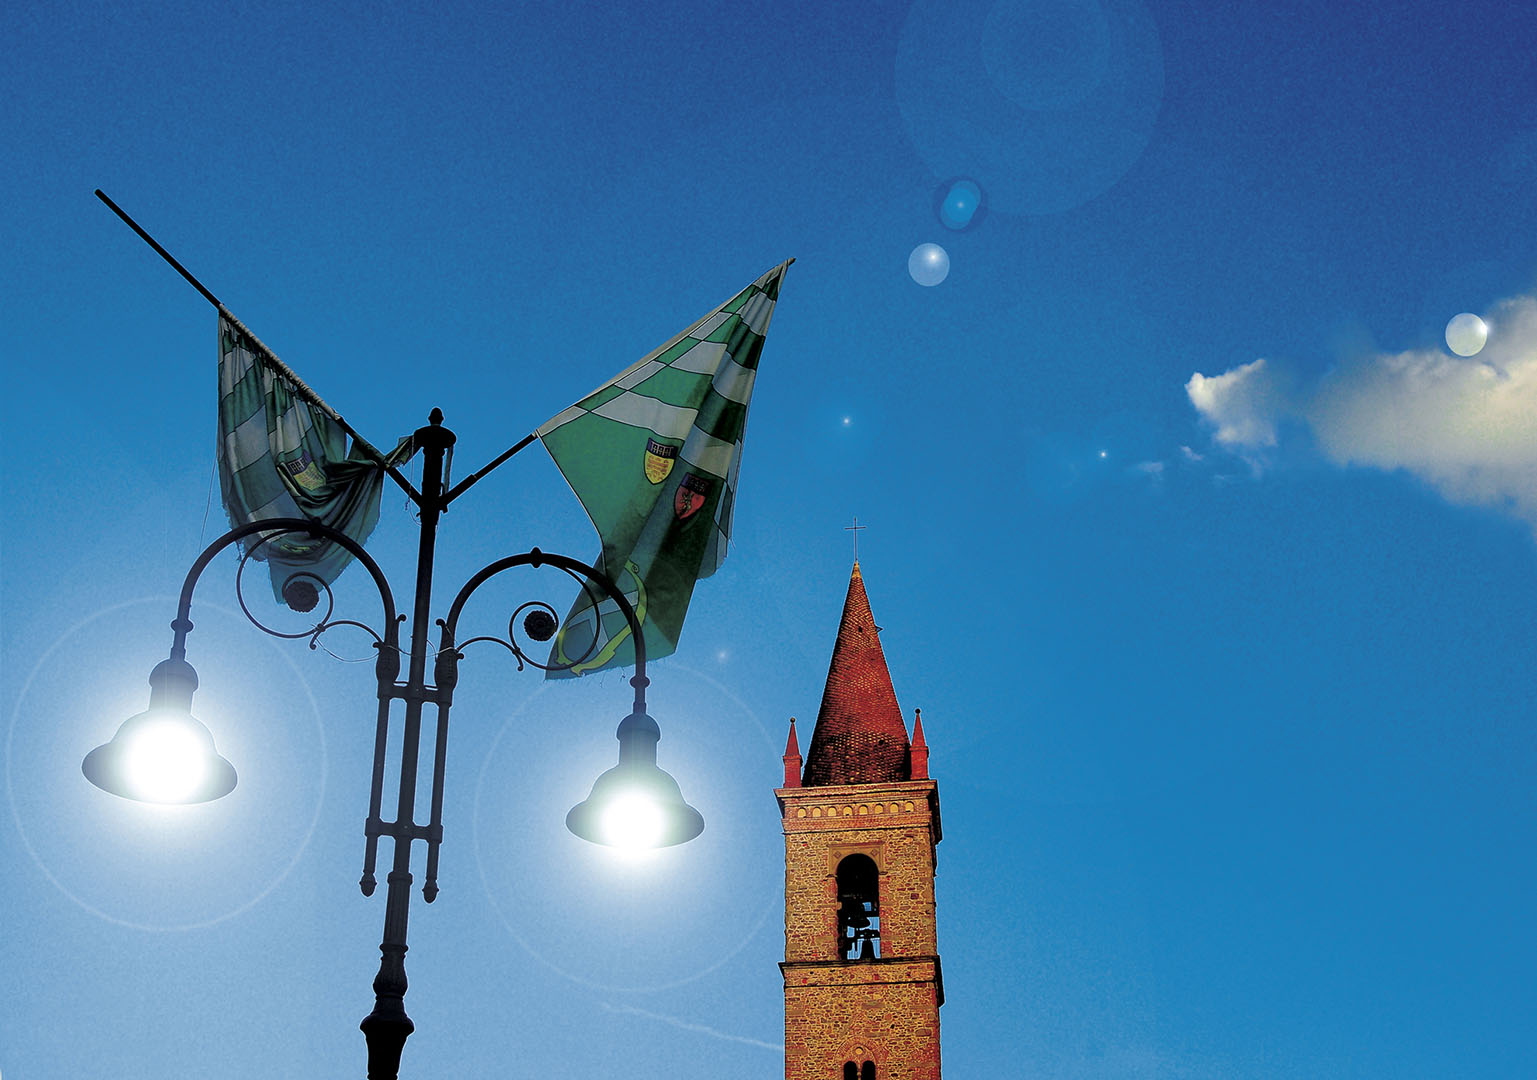 Arezzo_122_I14.7.87